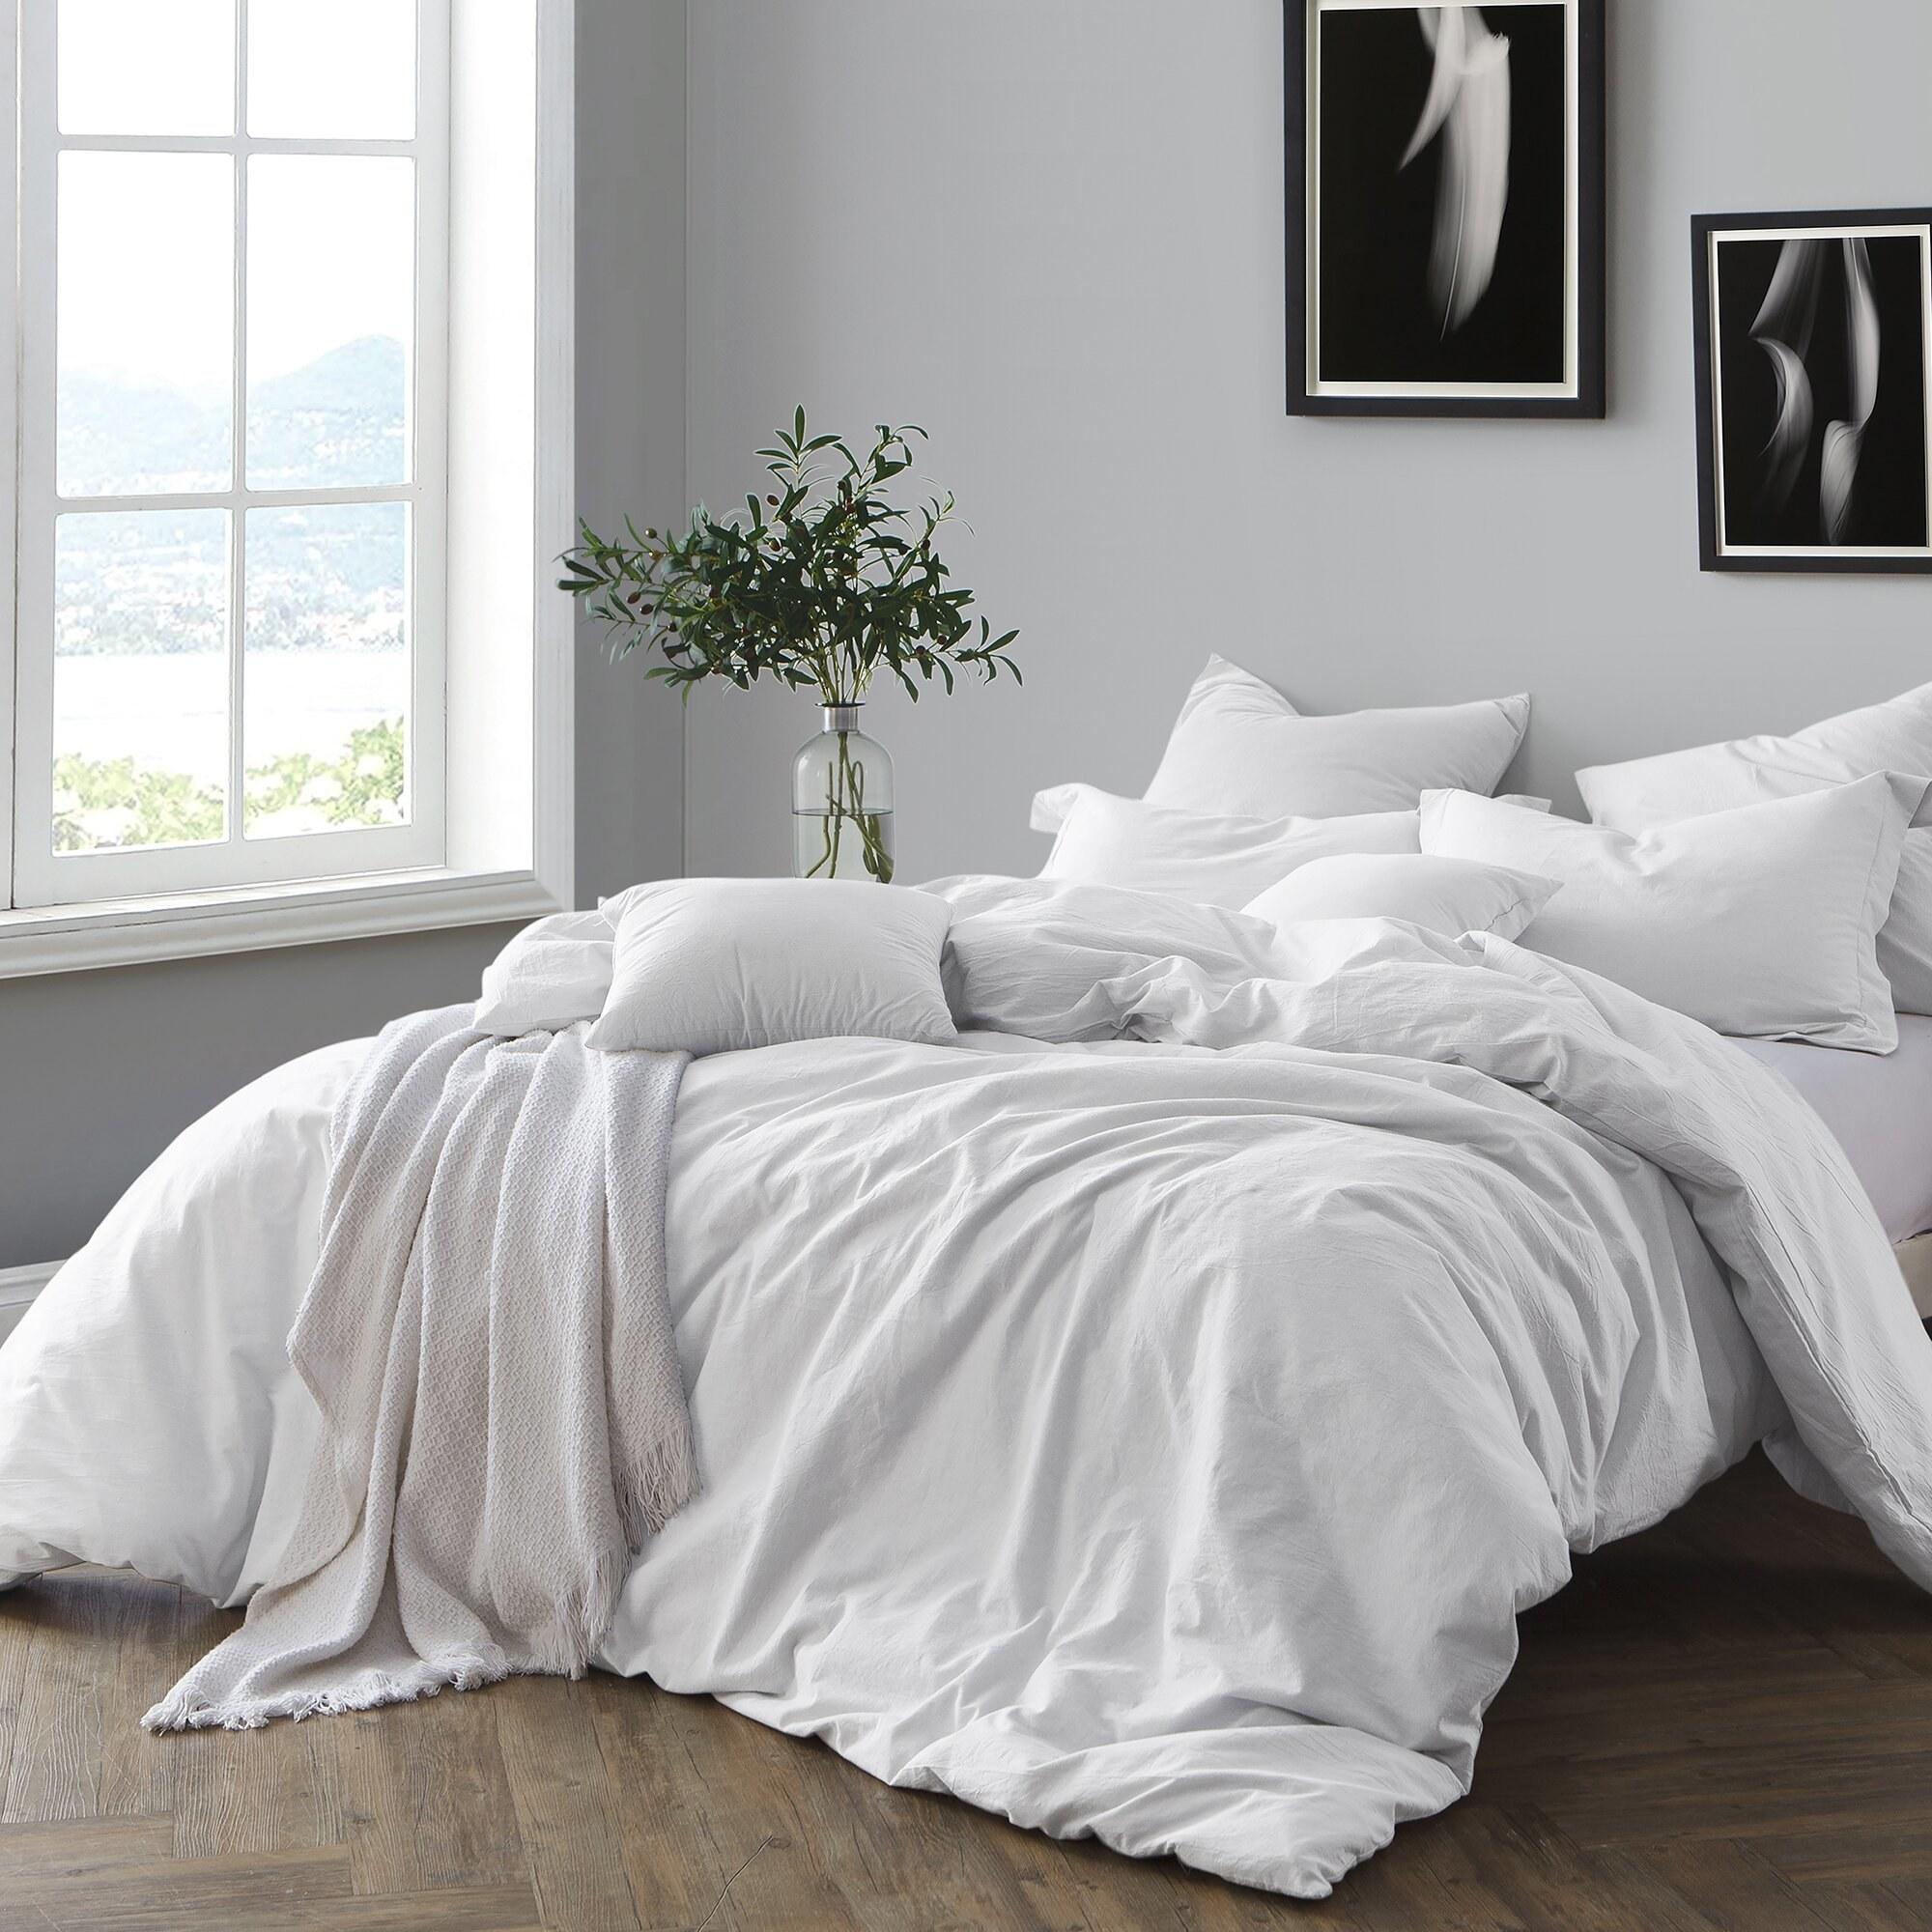 A white duvet set on a bed